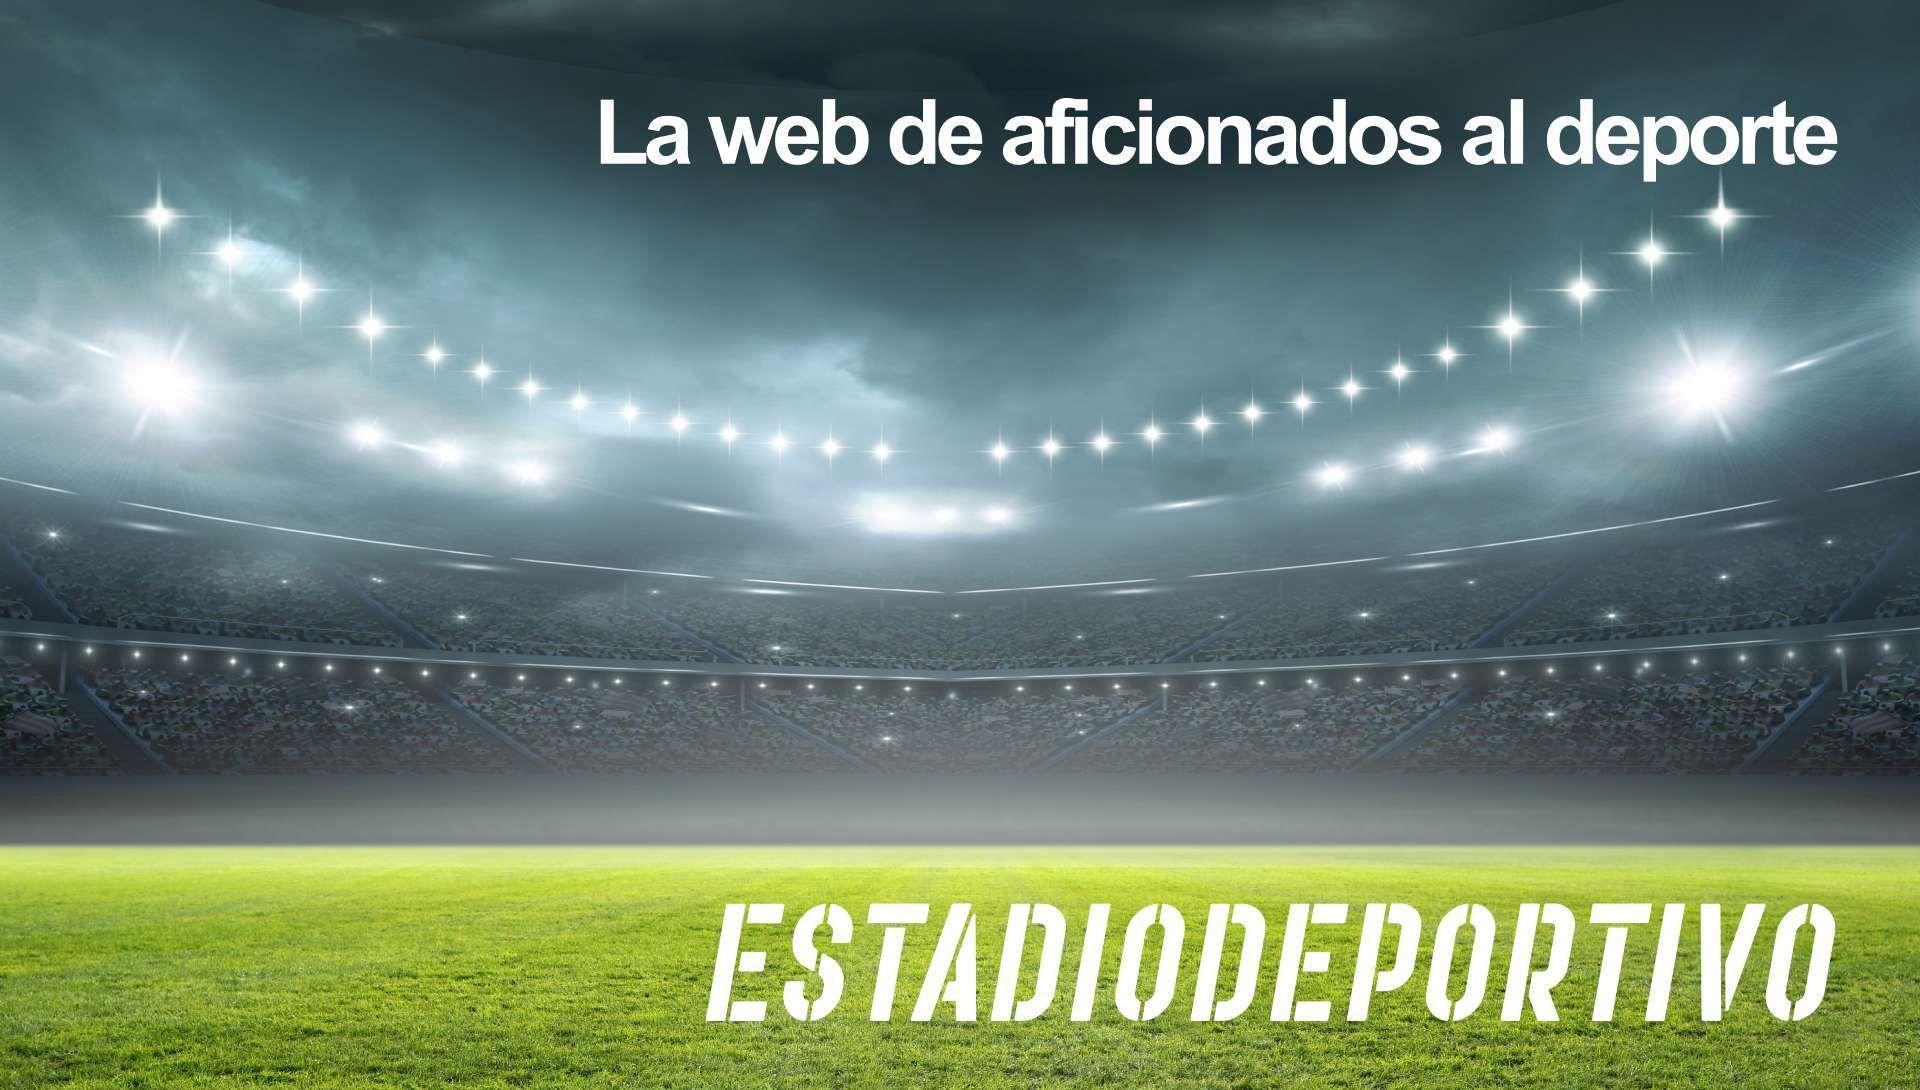 Carolina Abril downlod pic 30